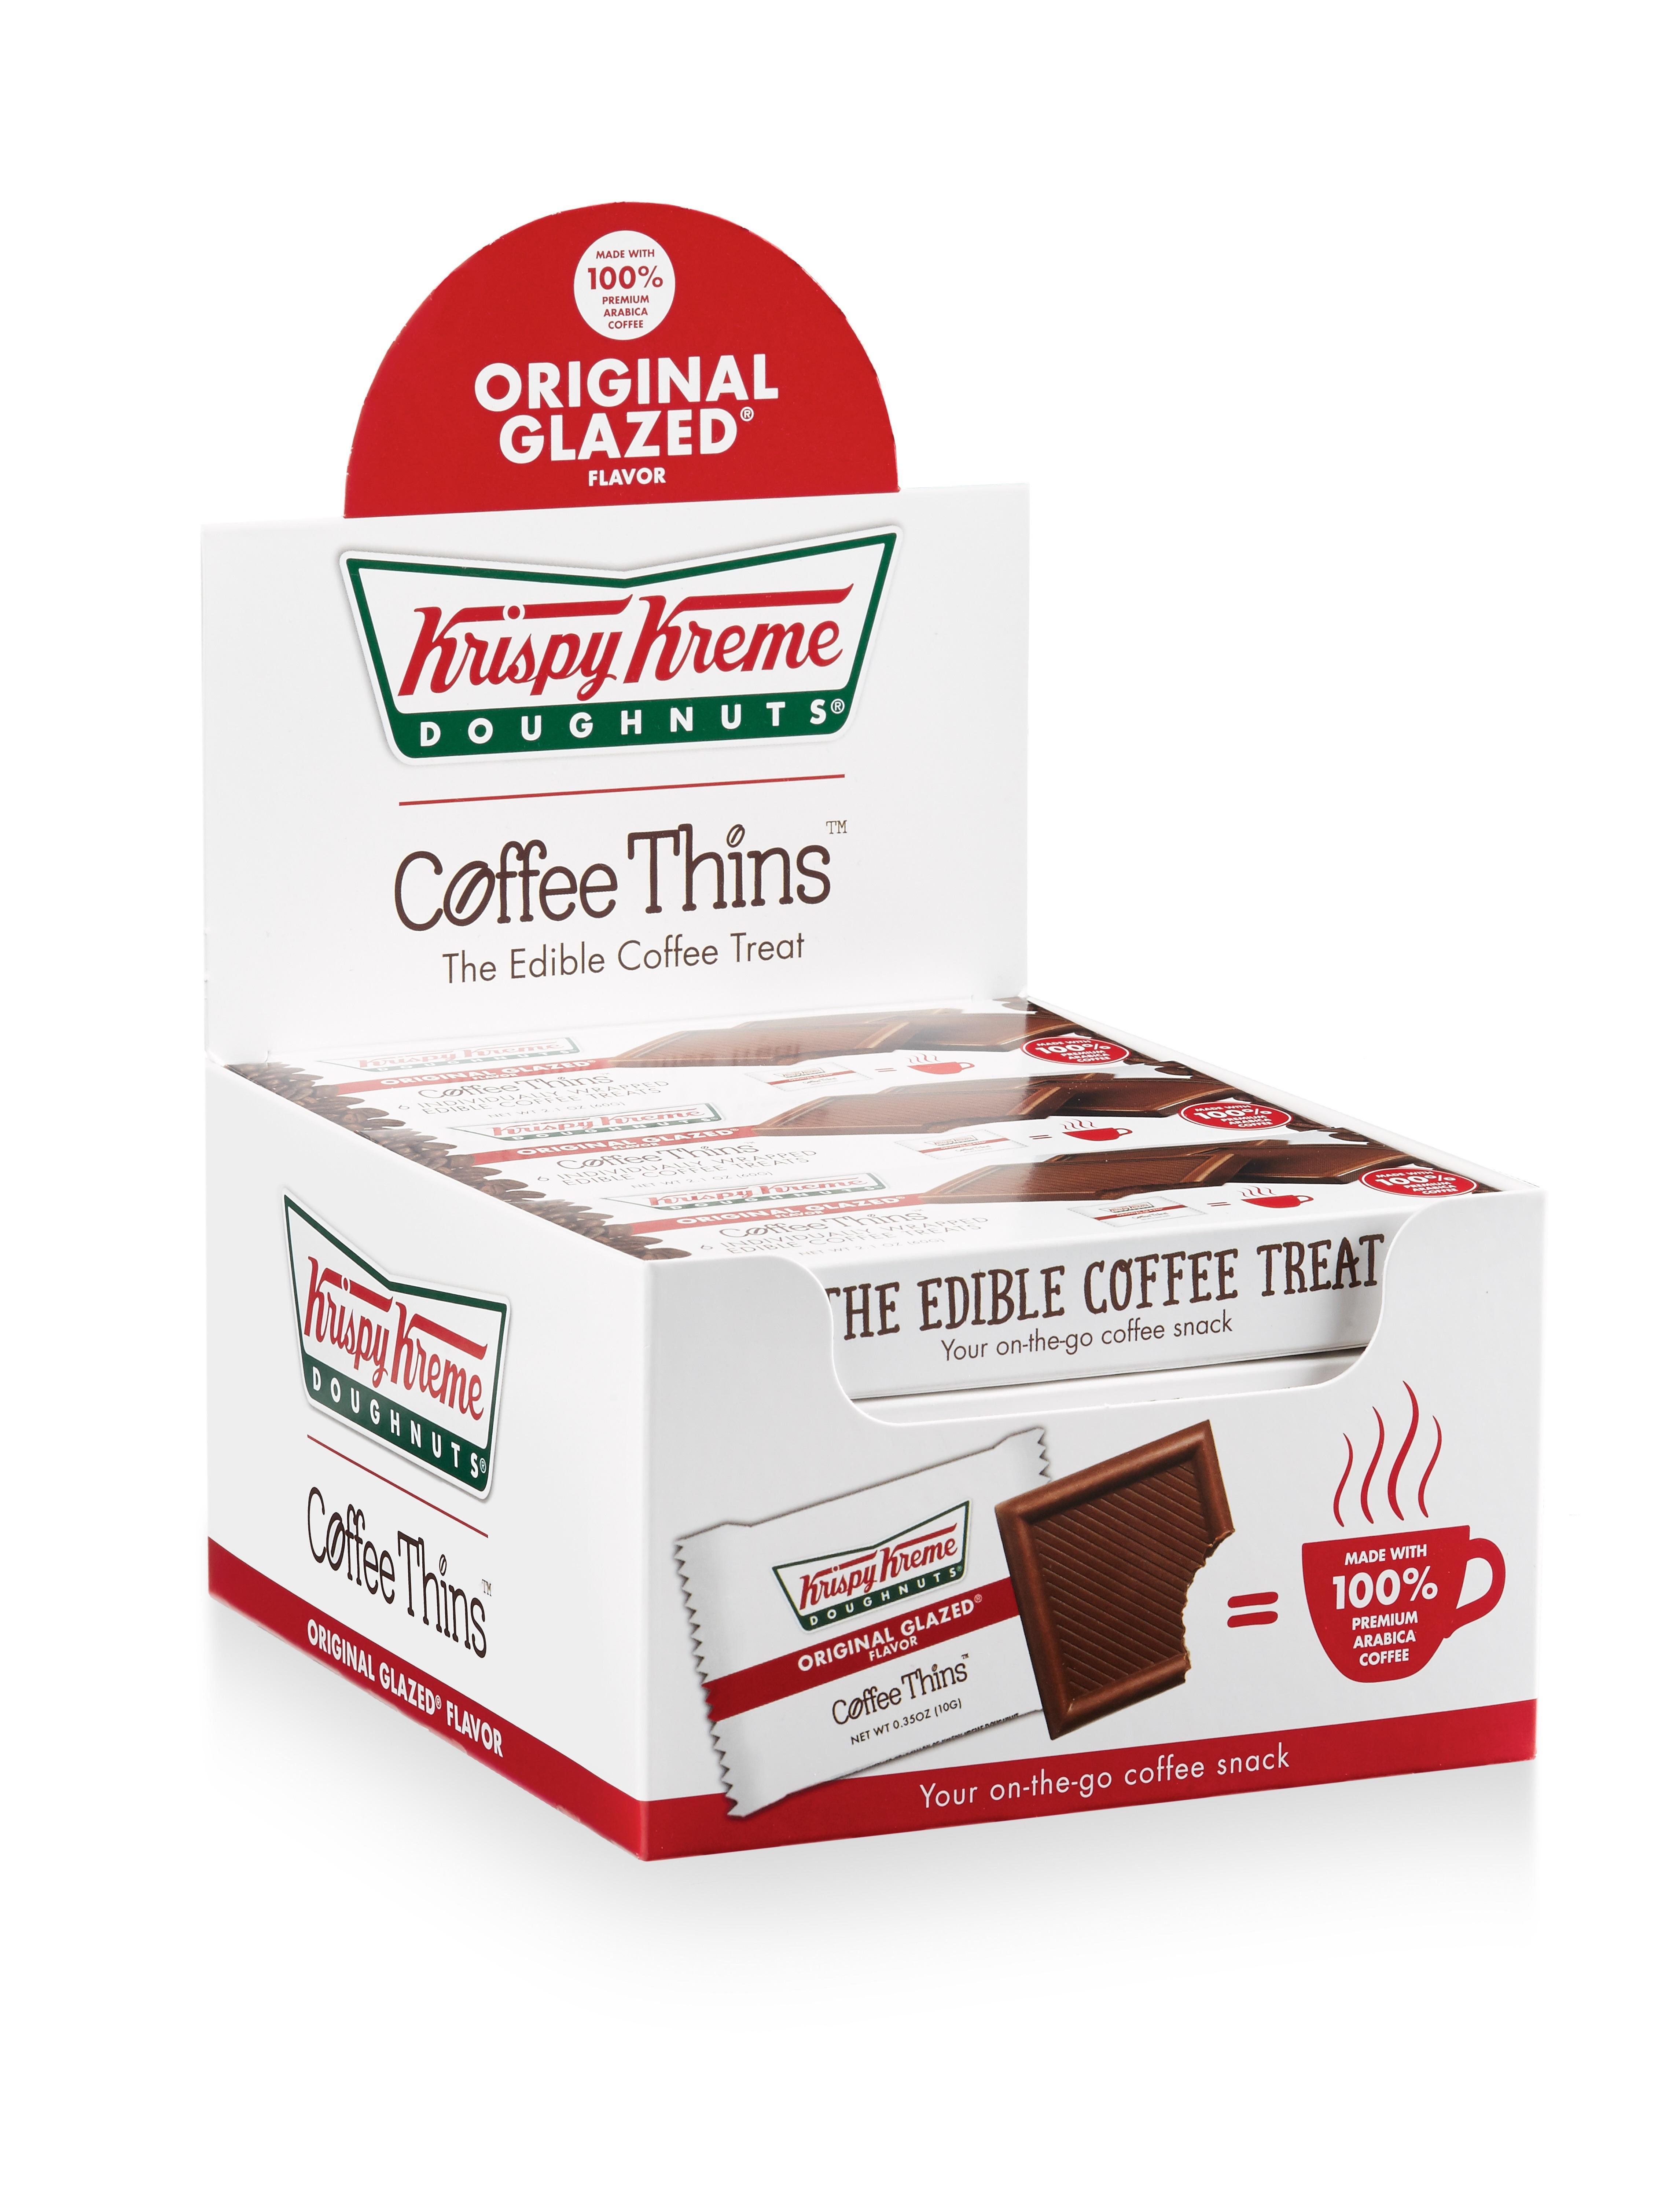 Get Your Coffee Fix: Krispy Kreme Doughnuts Announces Line of Edible ...